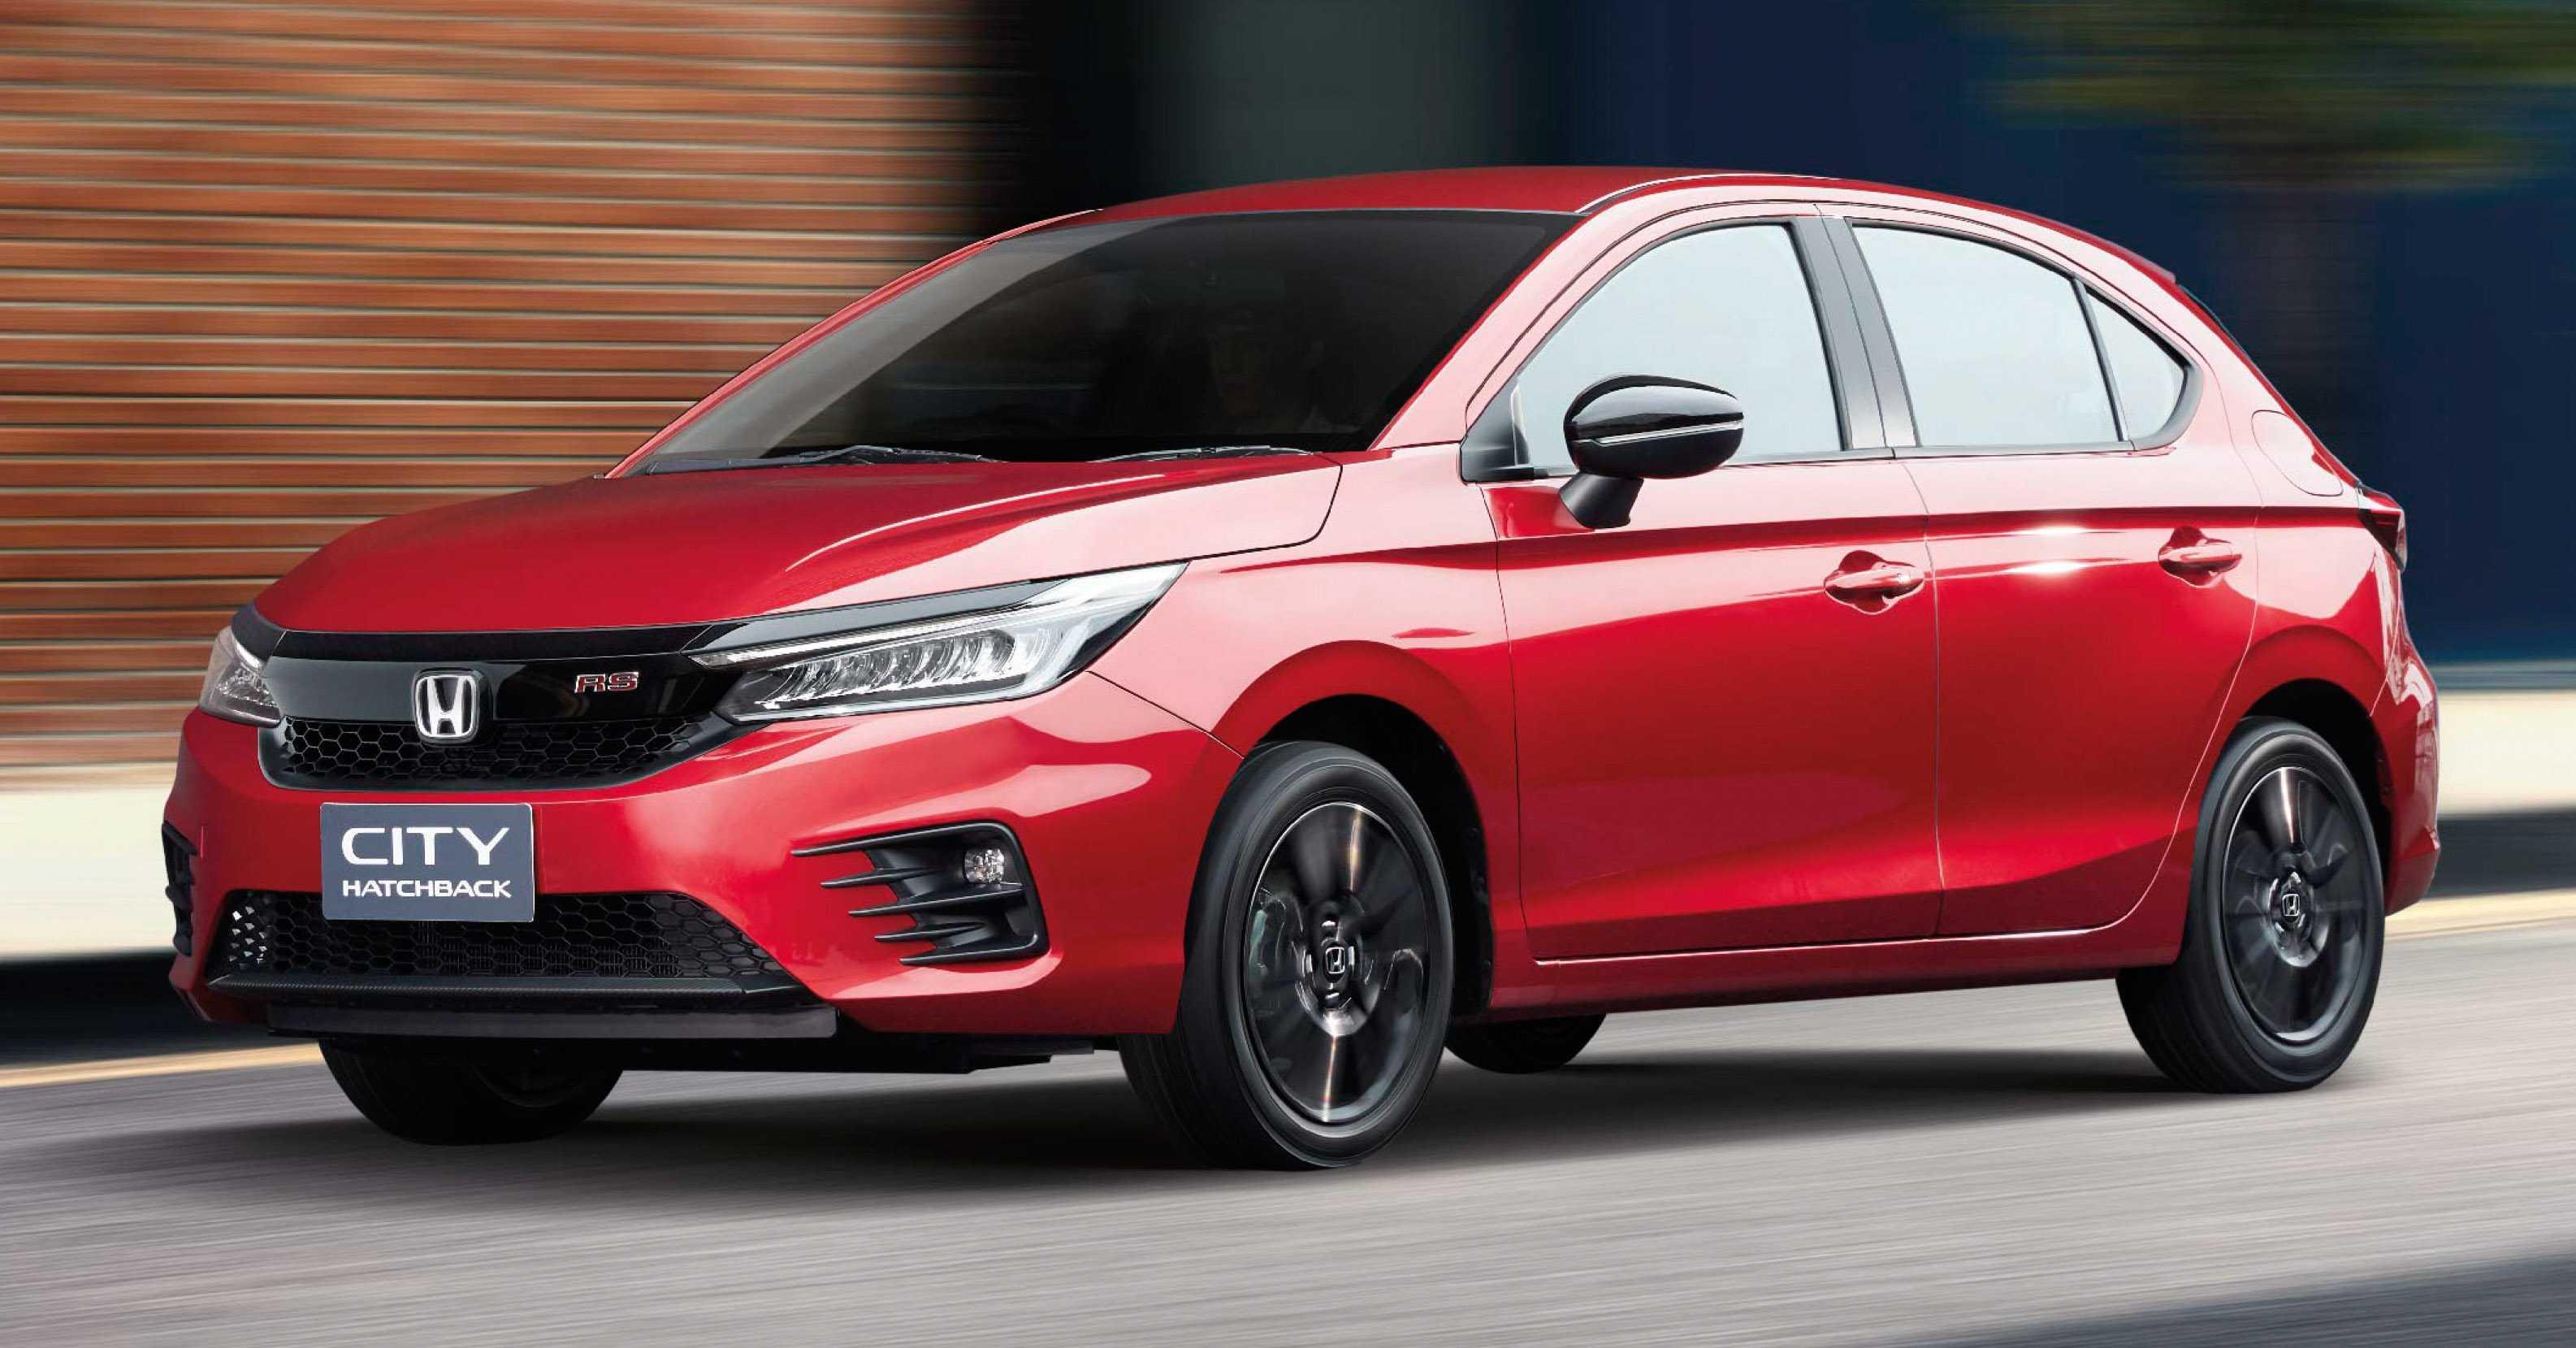 2021 Honda City Hatchback with 1.0L VTEC Turbo Global Launch Commences, Details Inside